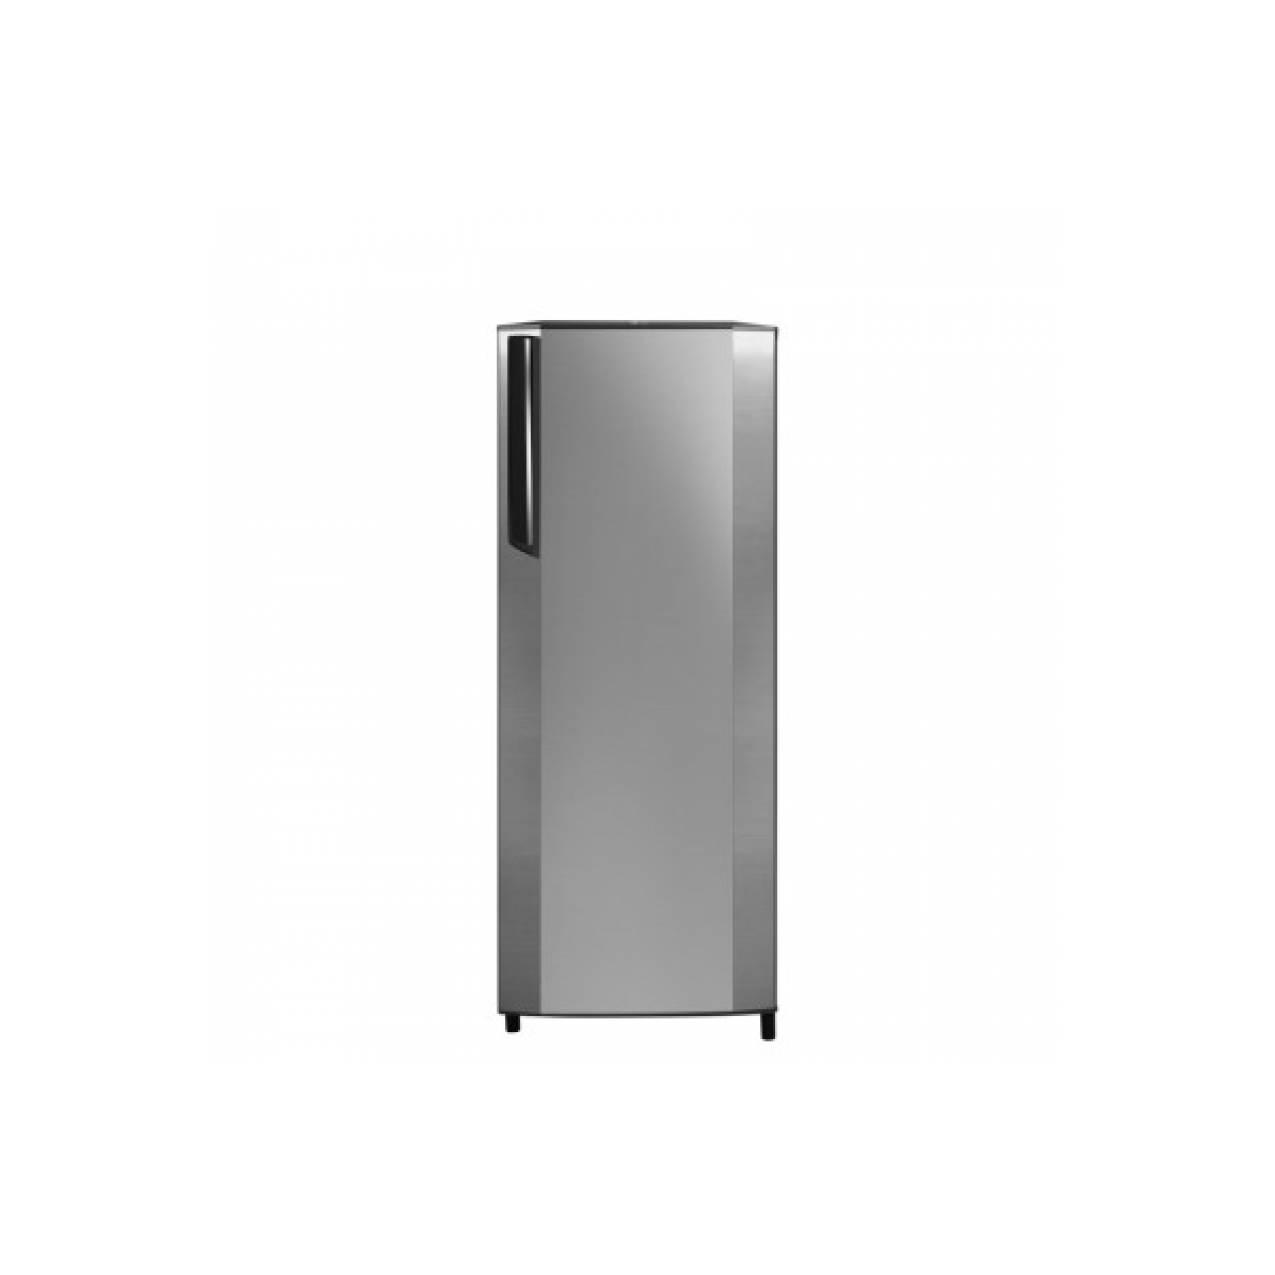 Freezer Panasonic NR-S17A